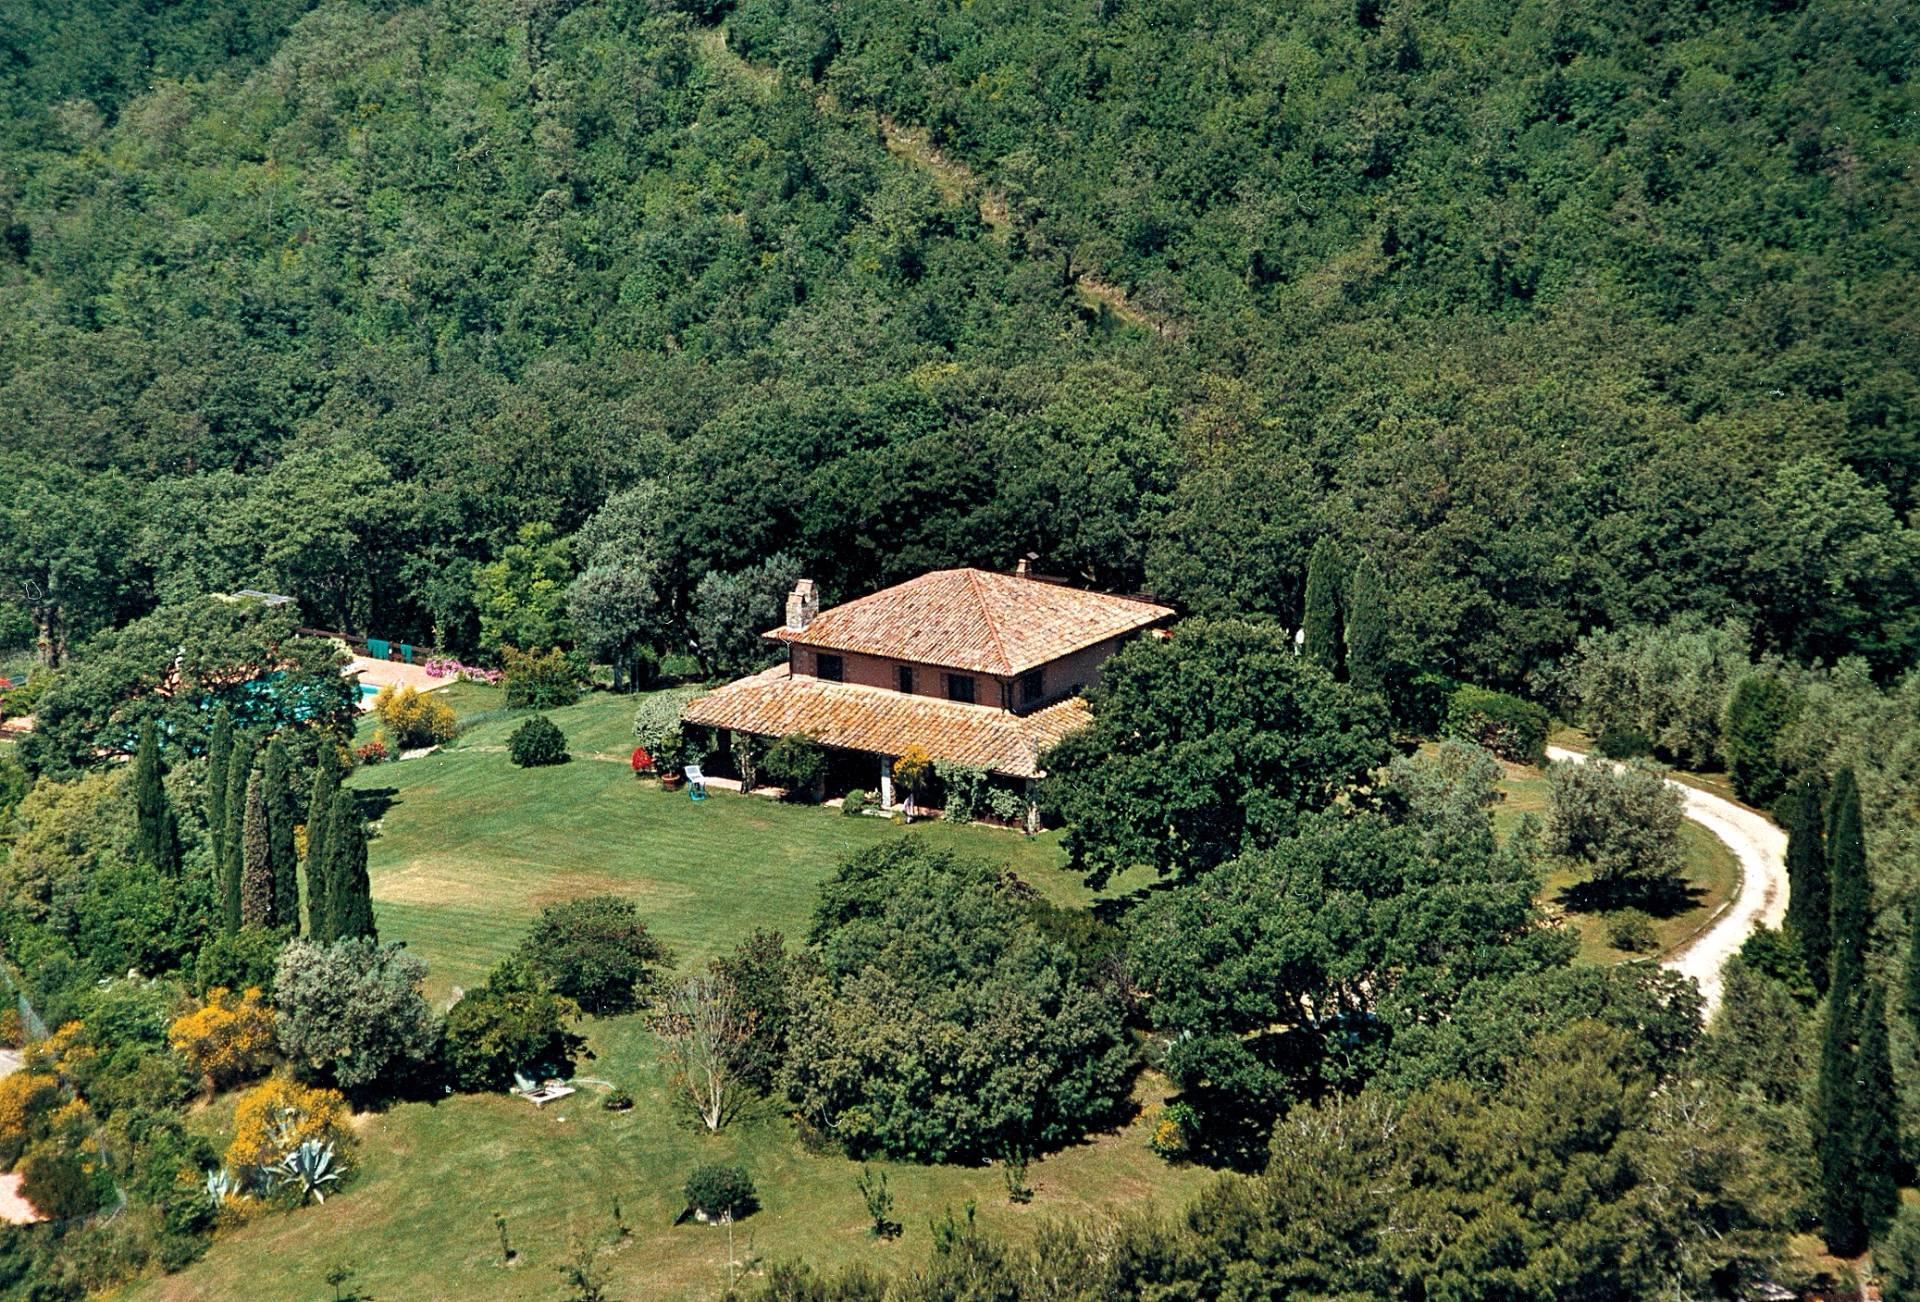 Splendida villa con viste mozzafiato del Monte Argentario - 3